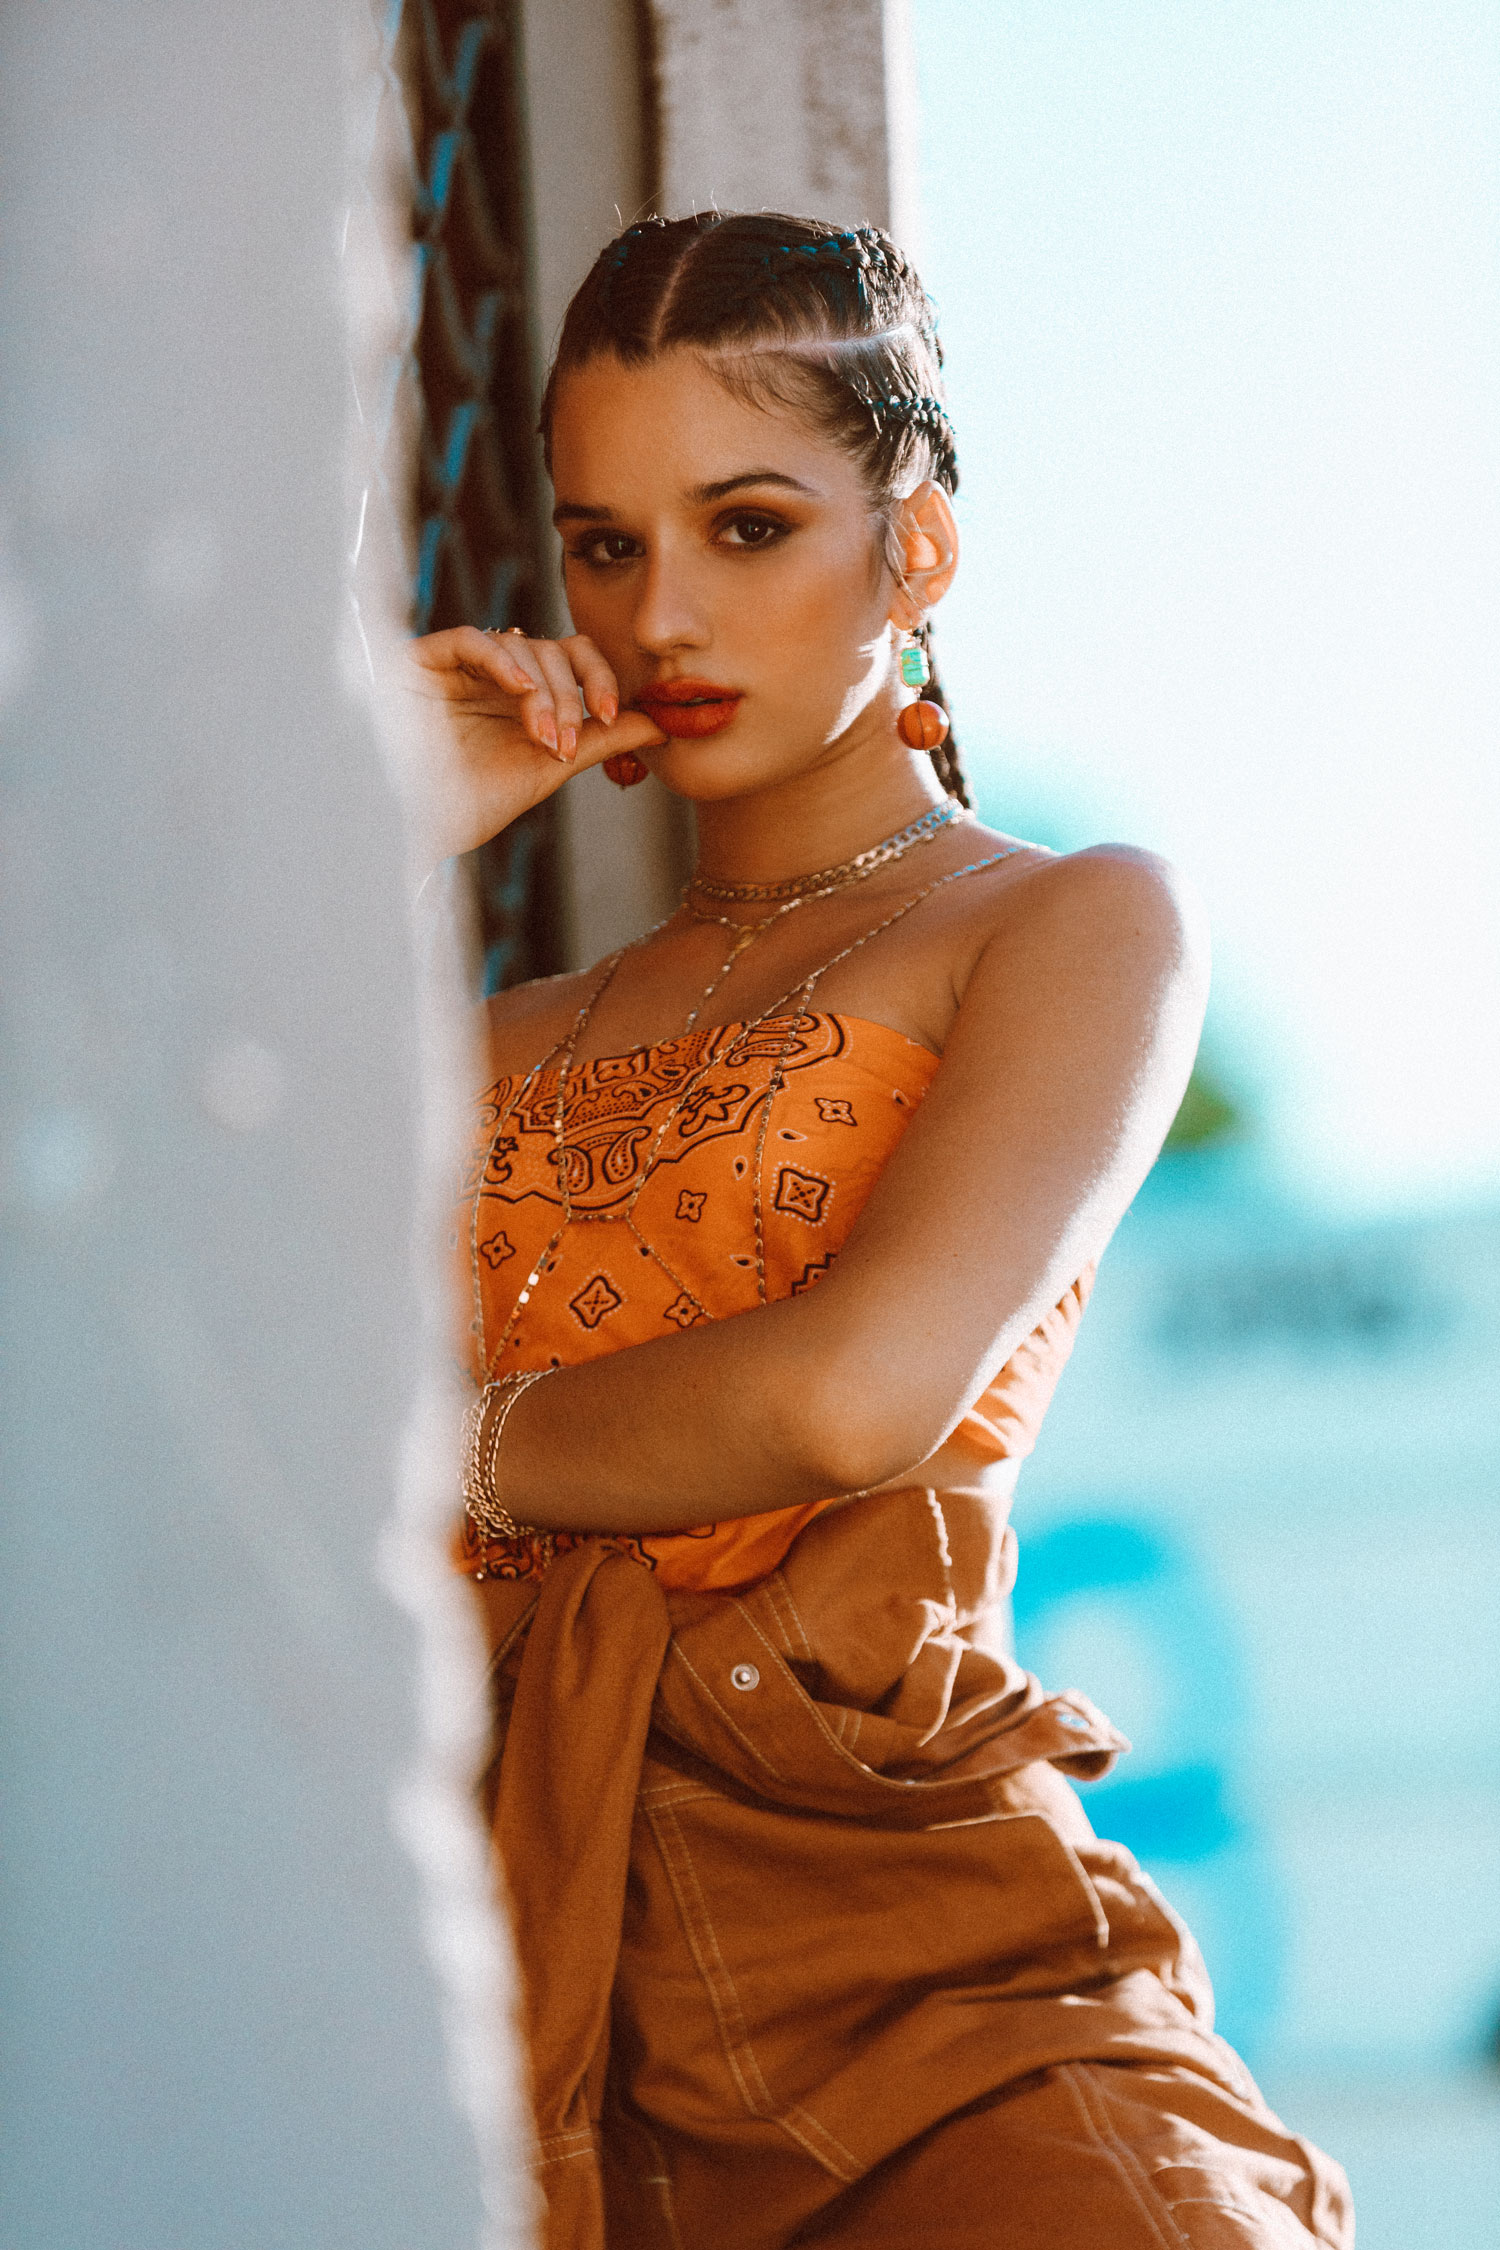 Bianca Costa